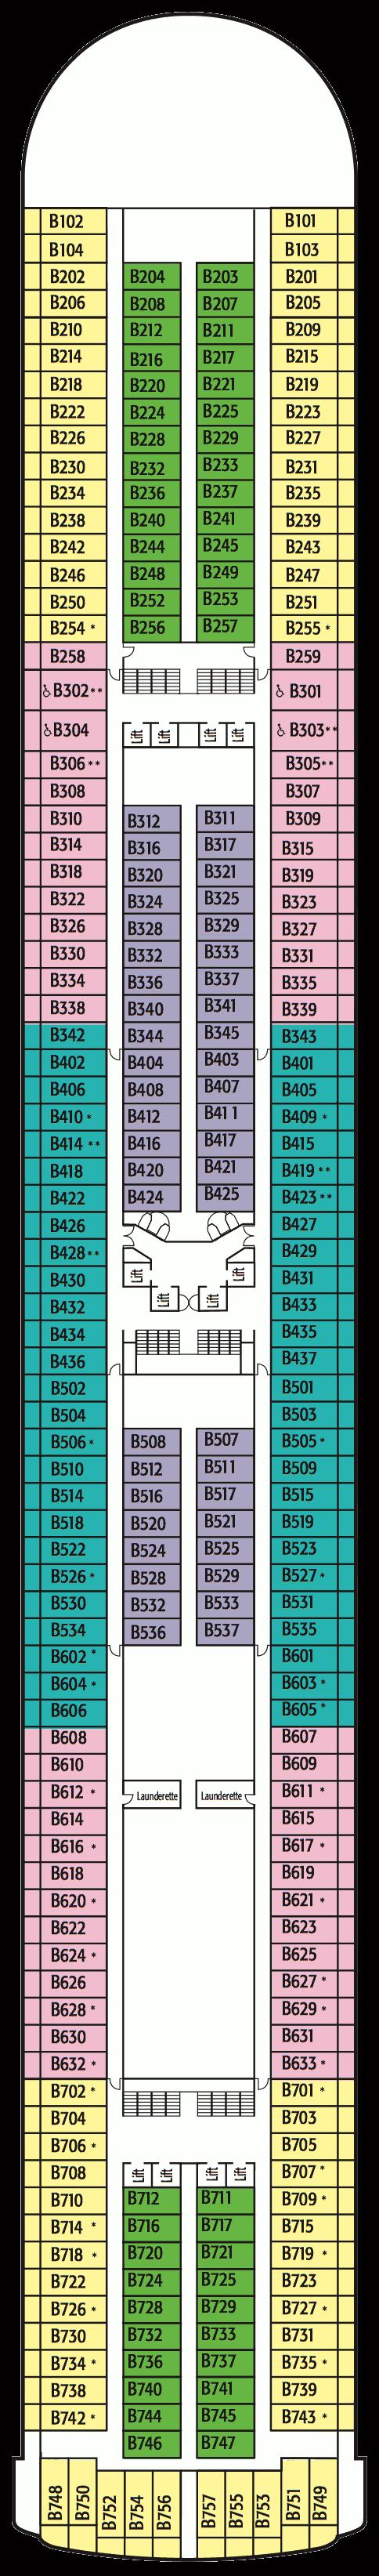 Azura Deck 11